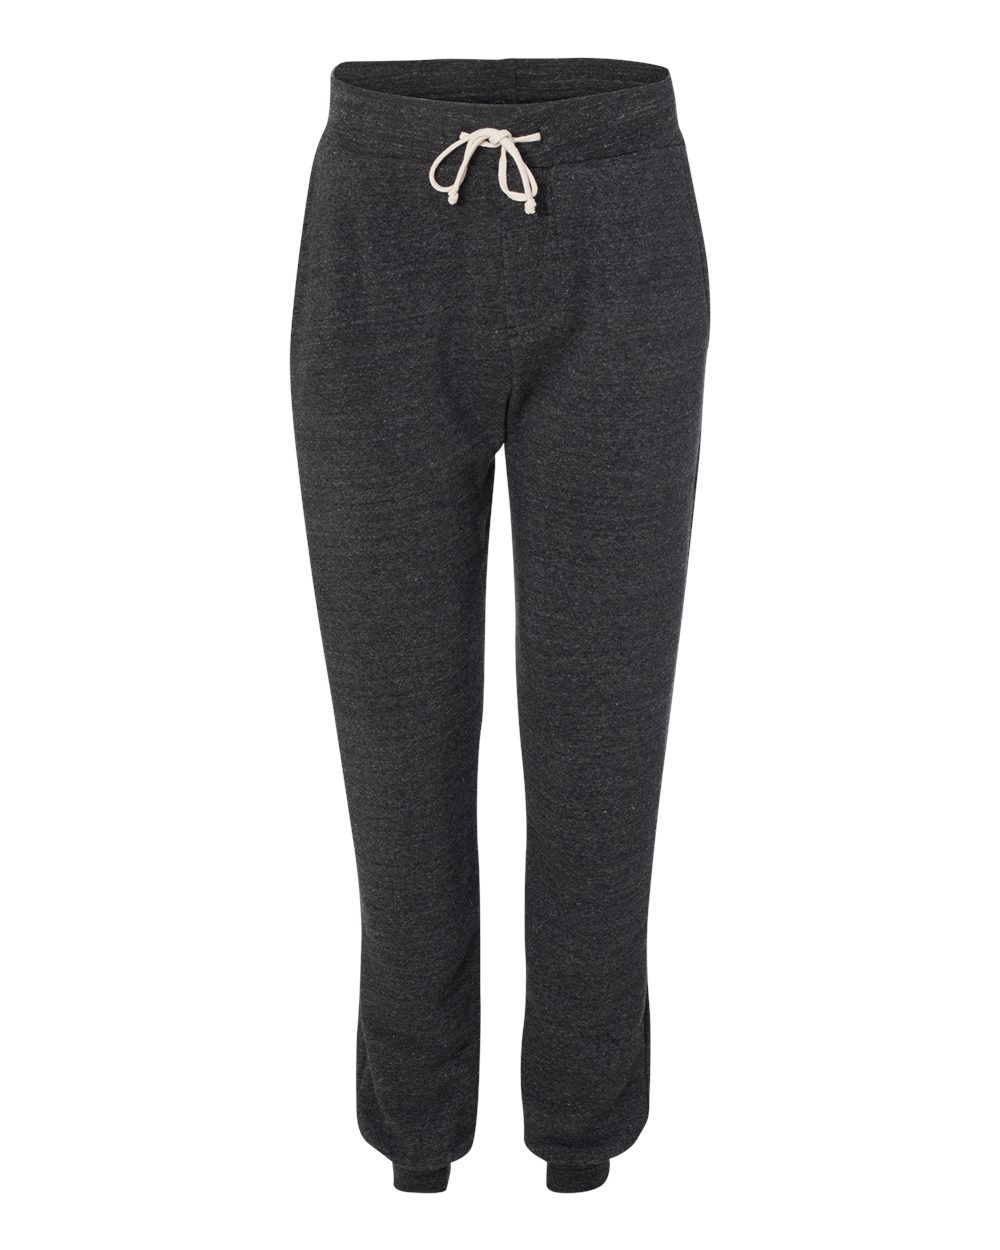 Alternative-Mens-Eco-Fleece-Dodgeball-Pants-Sweatpants-Pocket-9881-up-to-2XL thumbnail 6